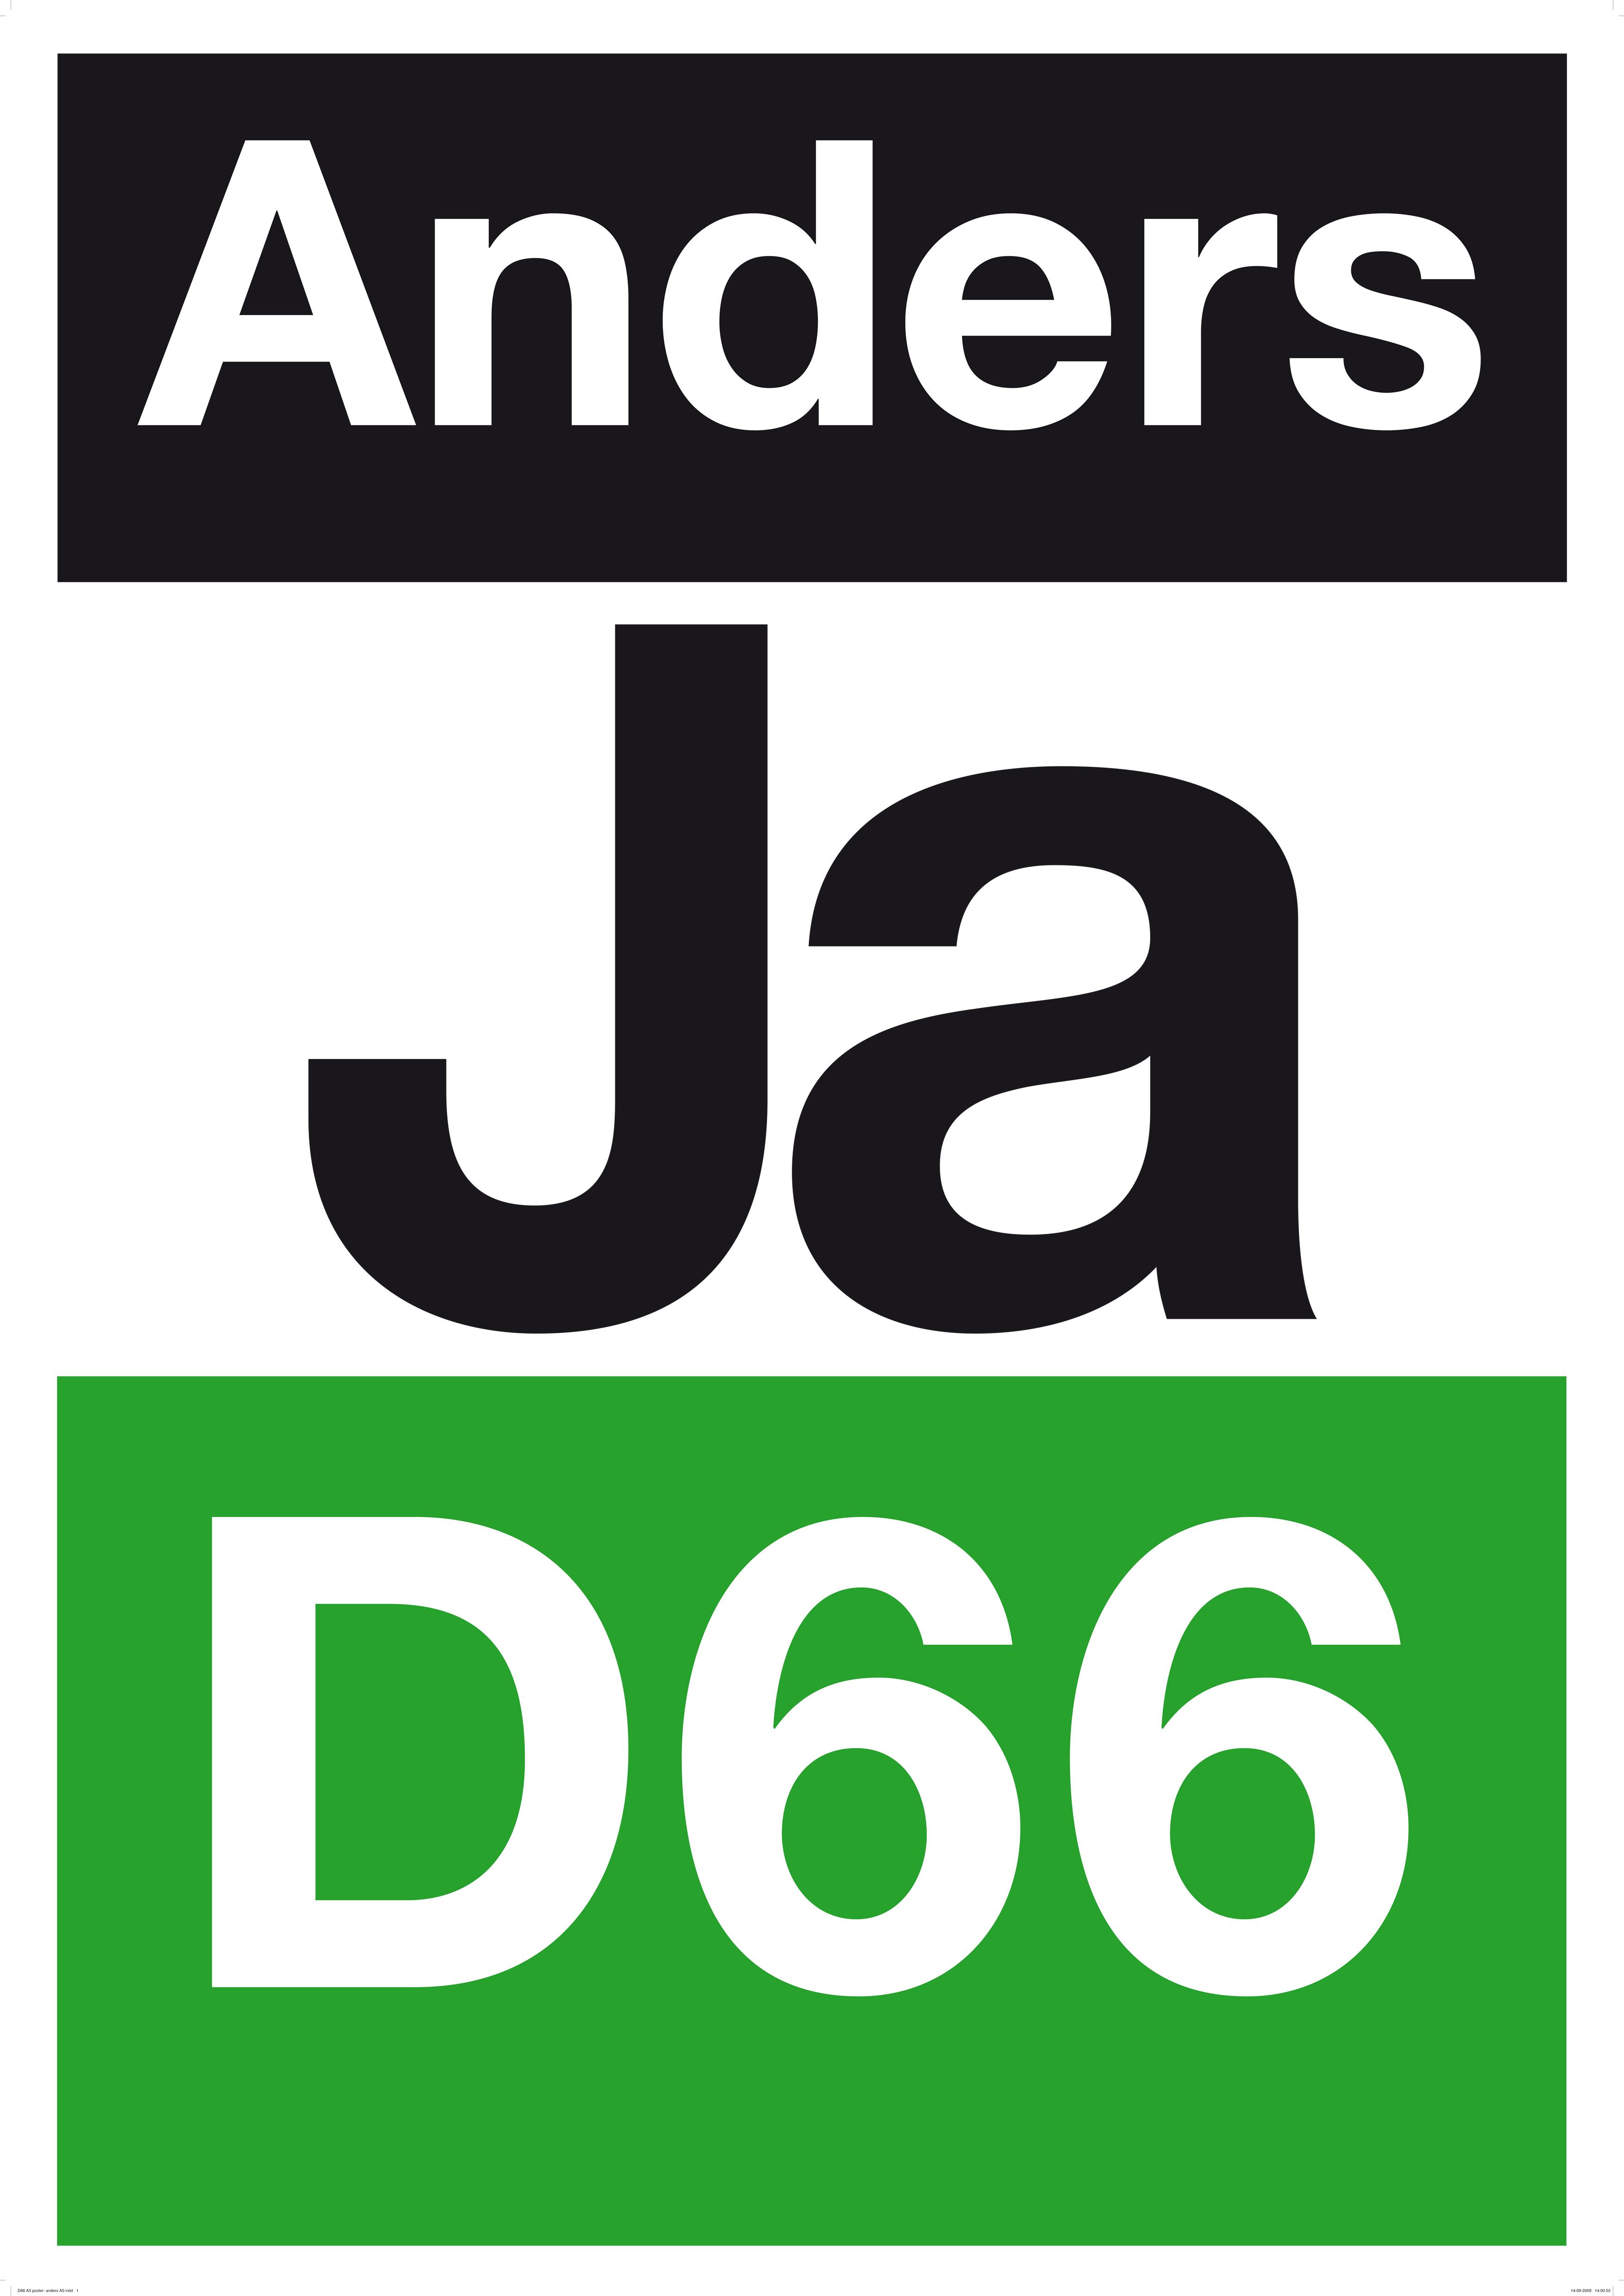 Bestand D66 Anders Ja A3 Jpg Wikipedia